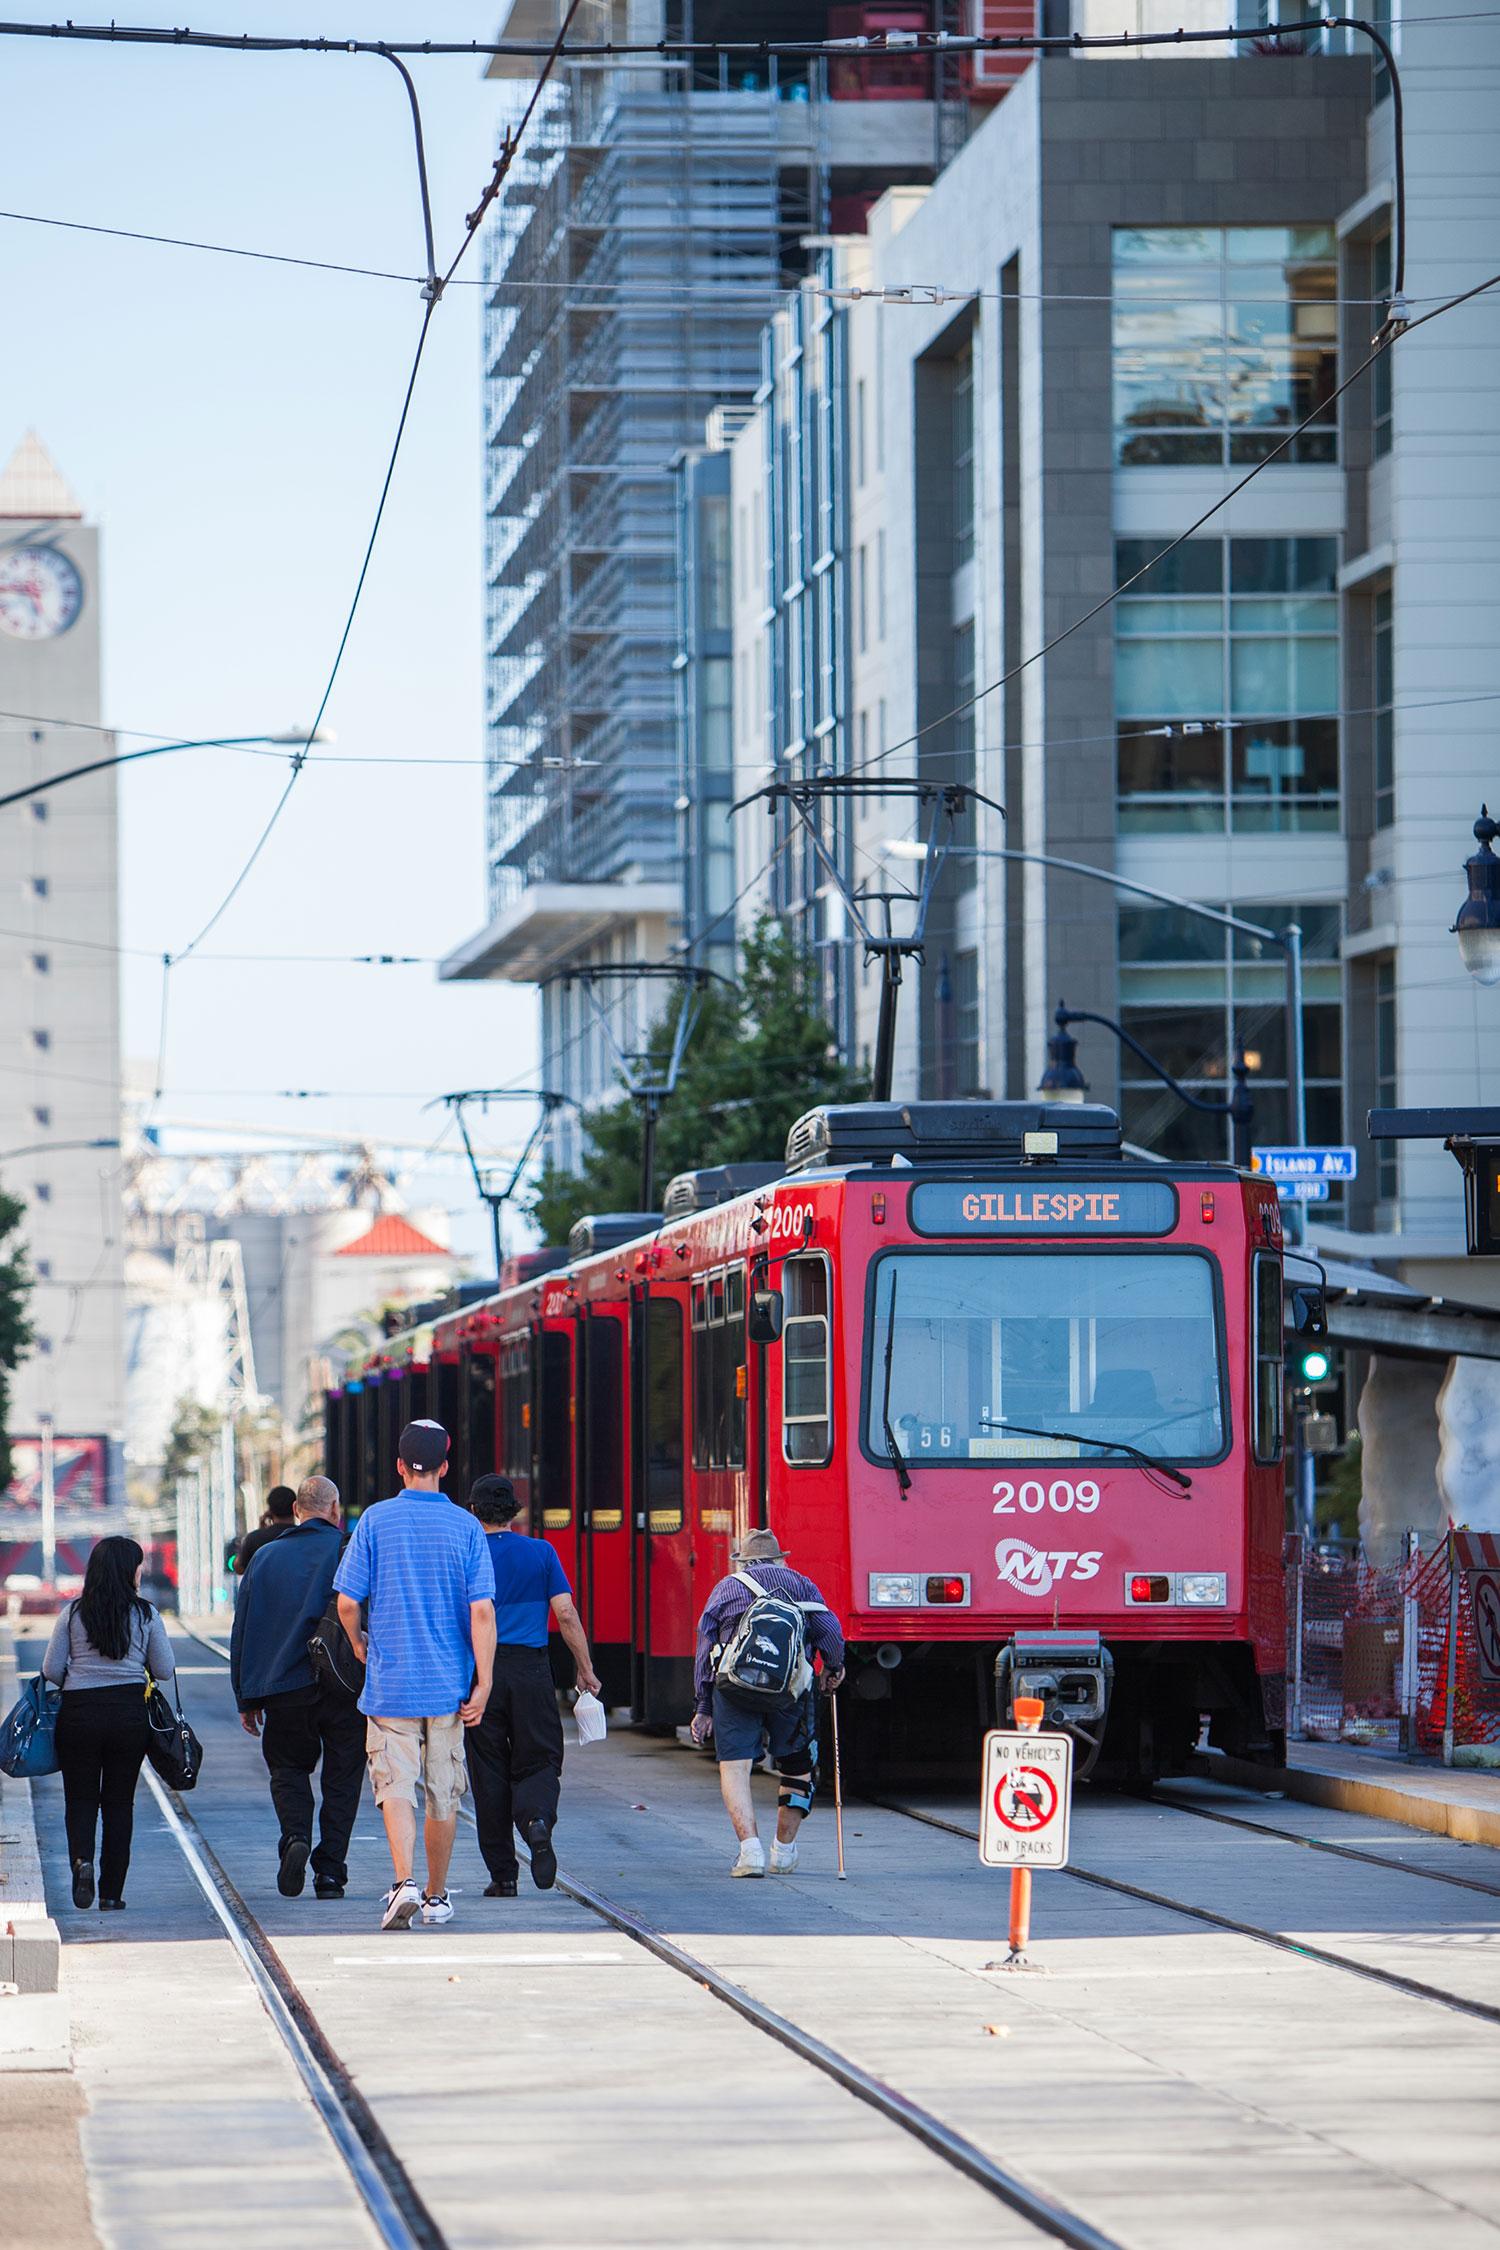 miriello-grafico-MTS-San-Diego-Transportation-bus-trolley-rapid-branding-agency-23.jpg